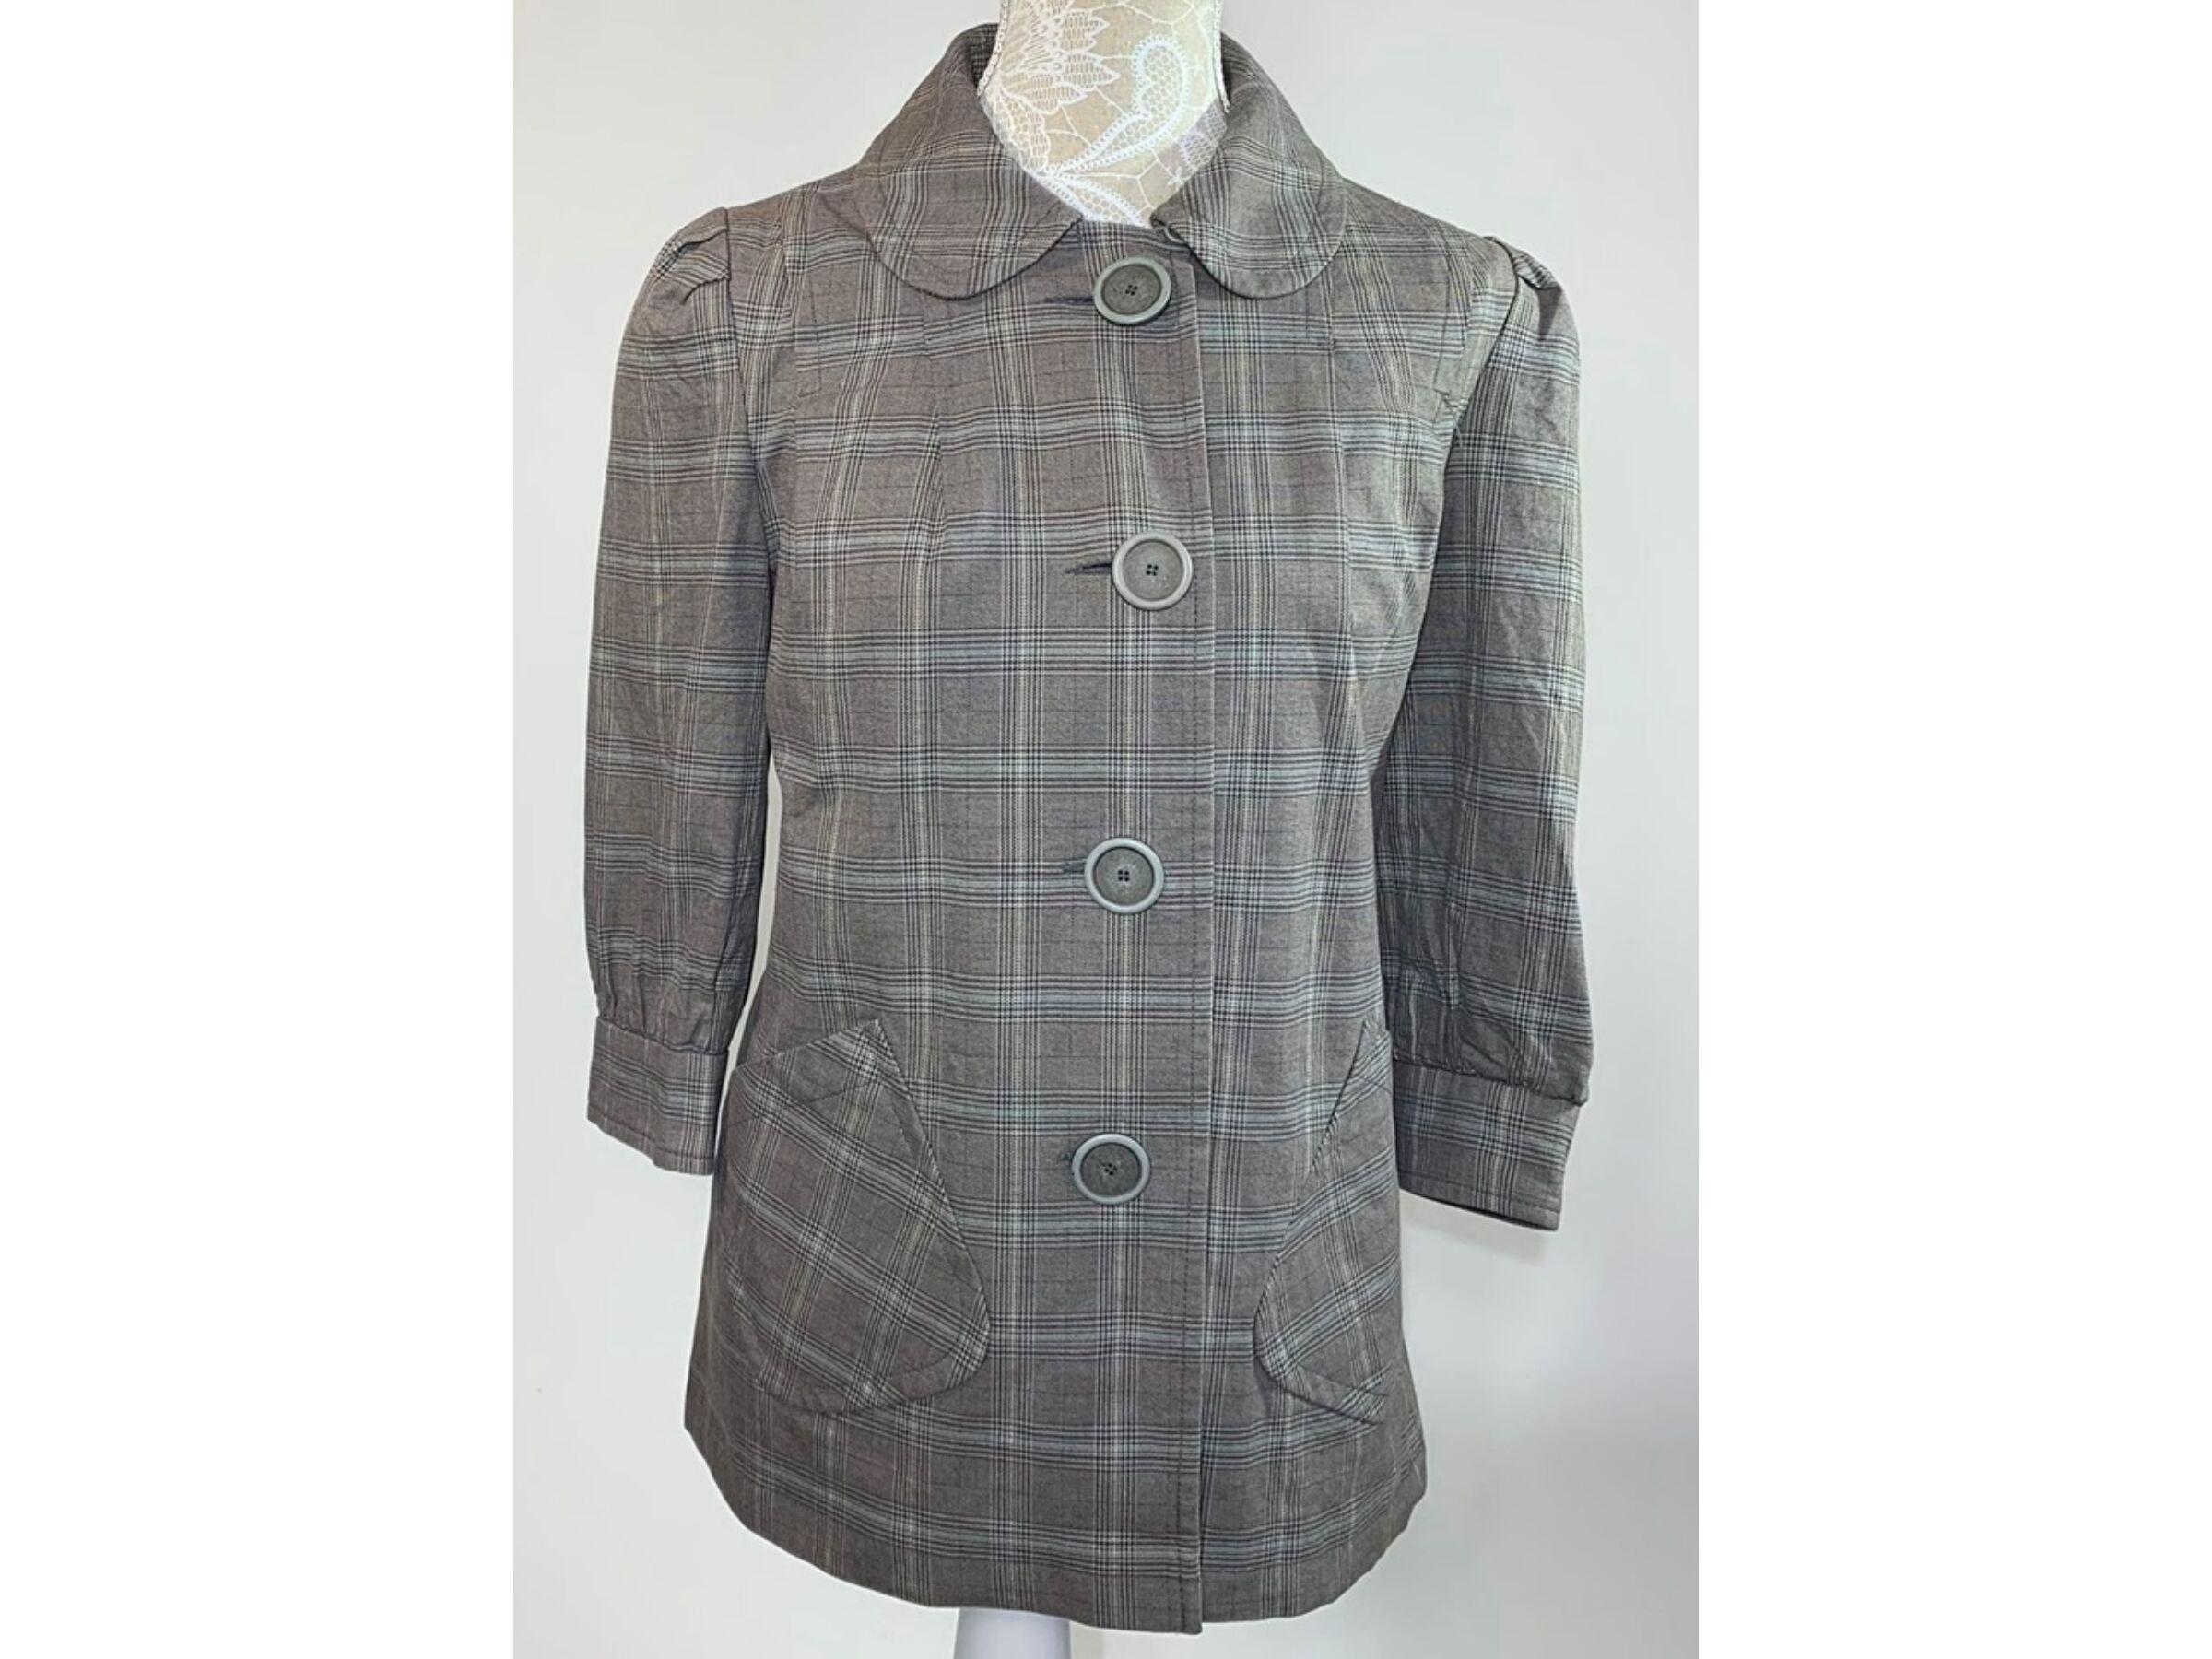 River Island kabát (M)